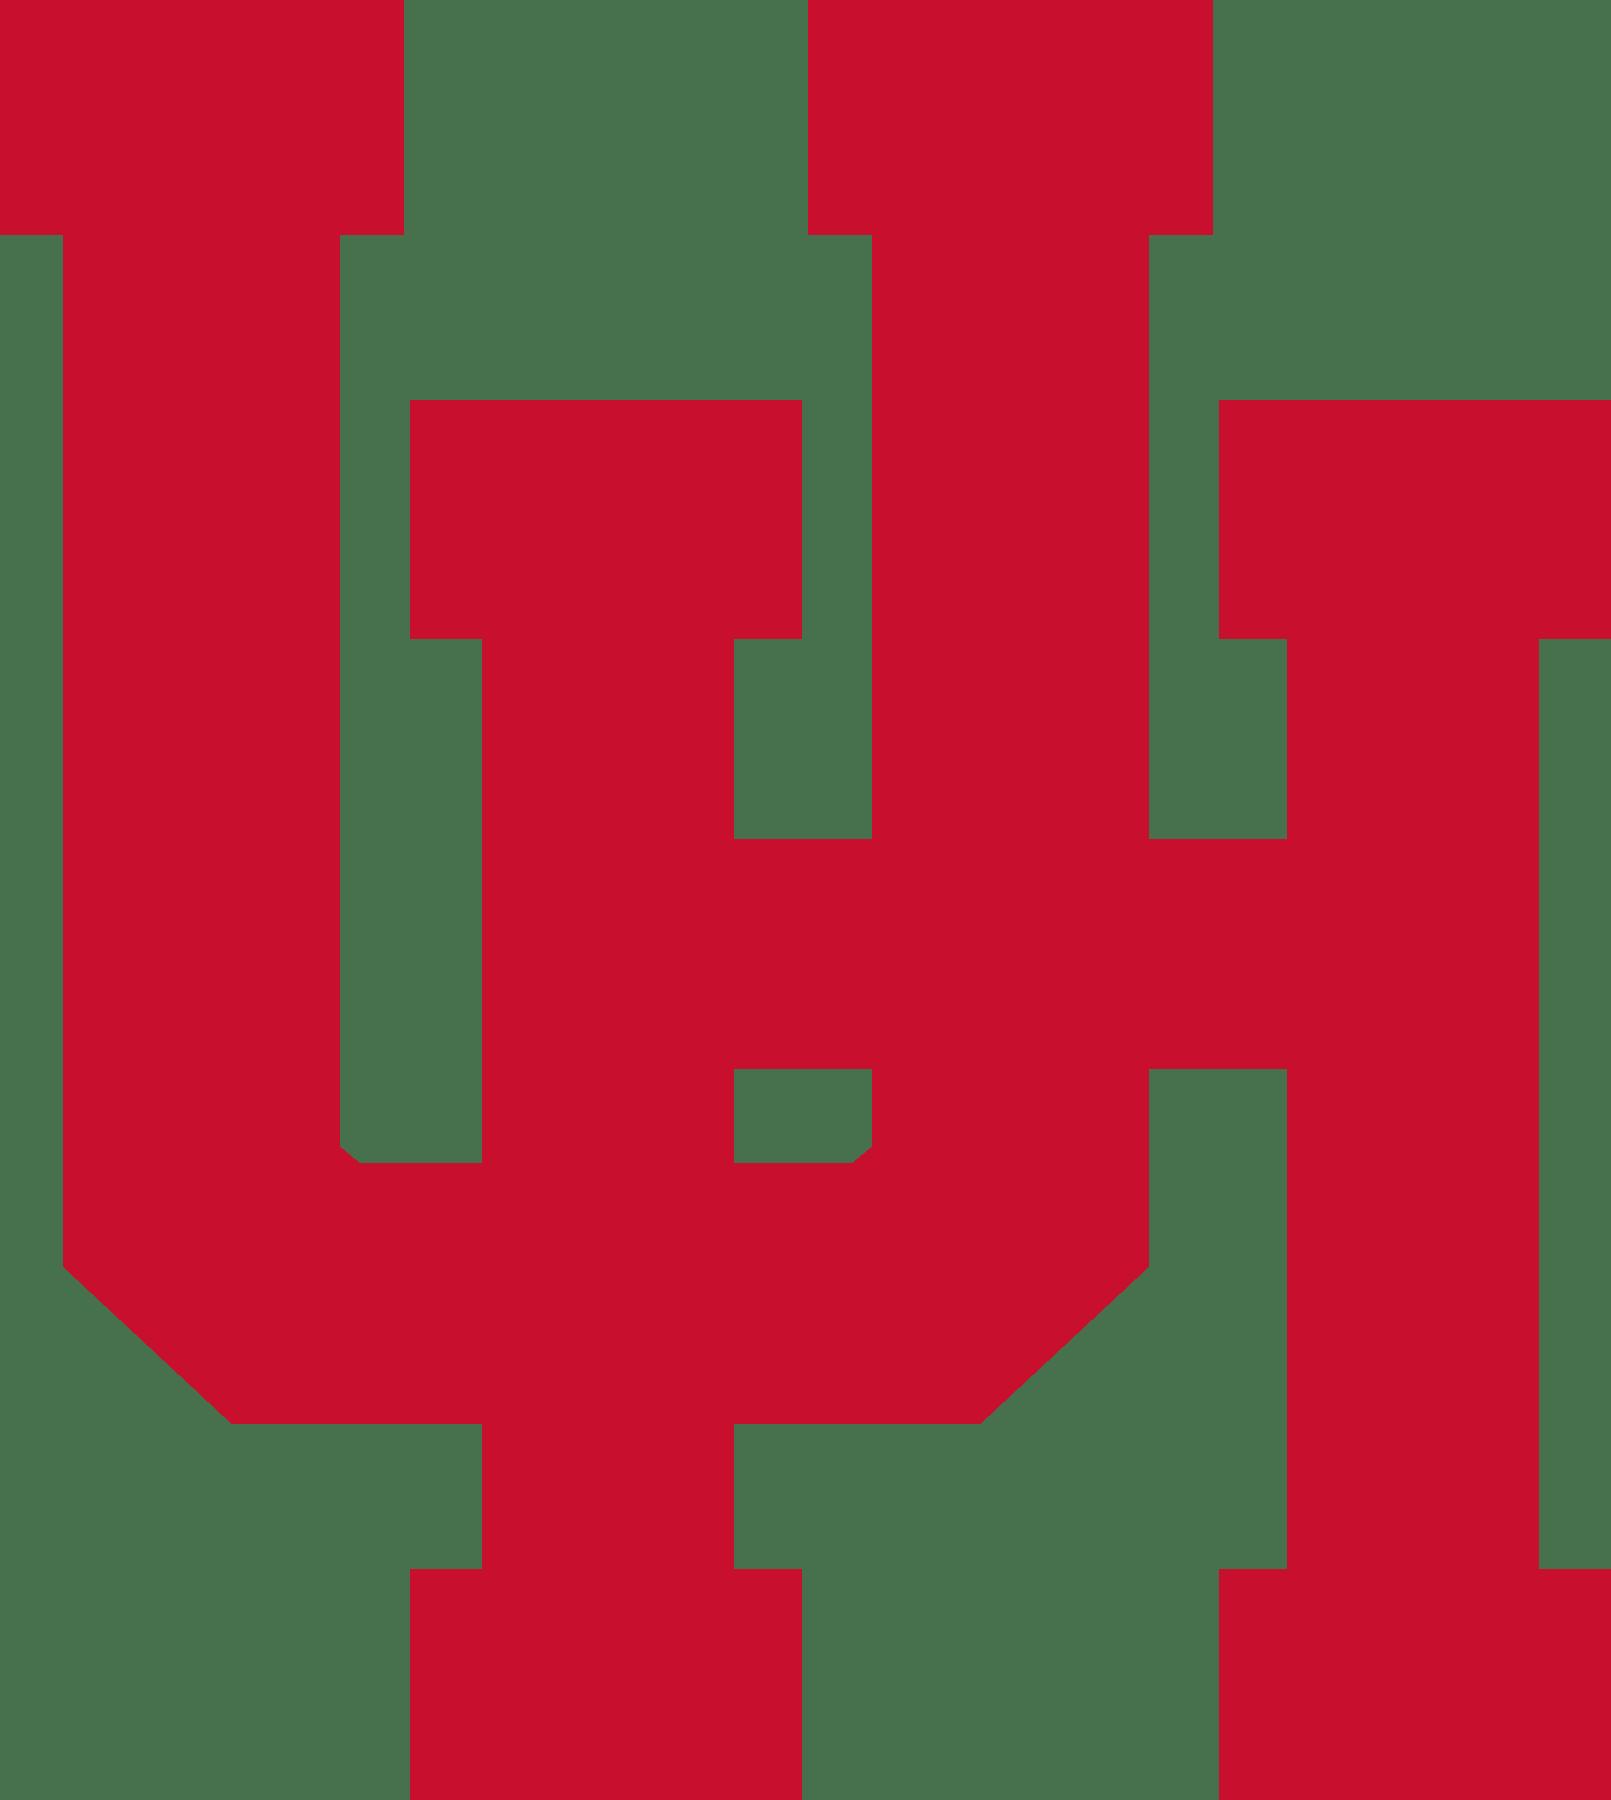 hight resolution of file university of houston collegiate logo png